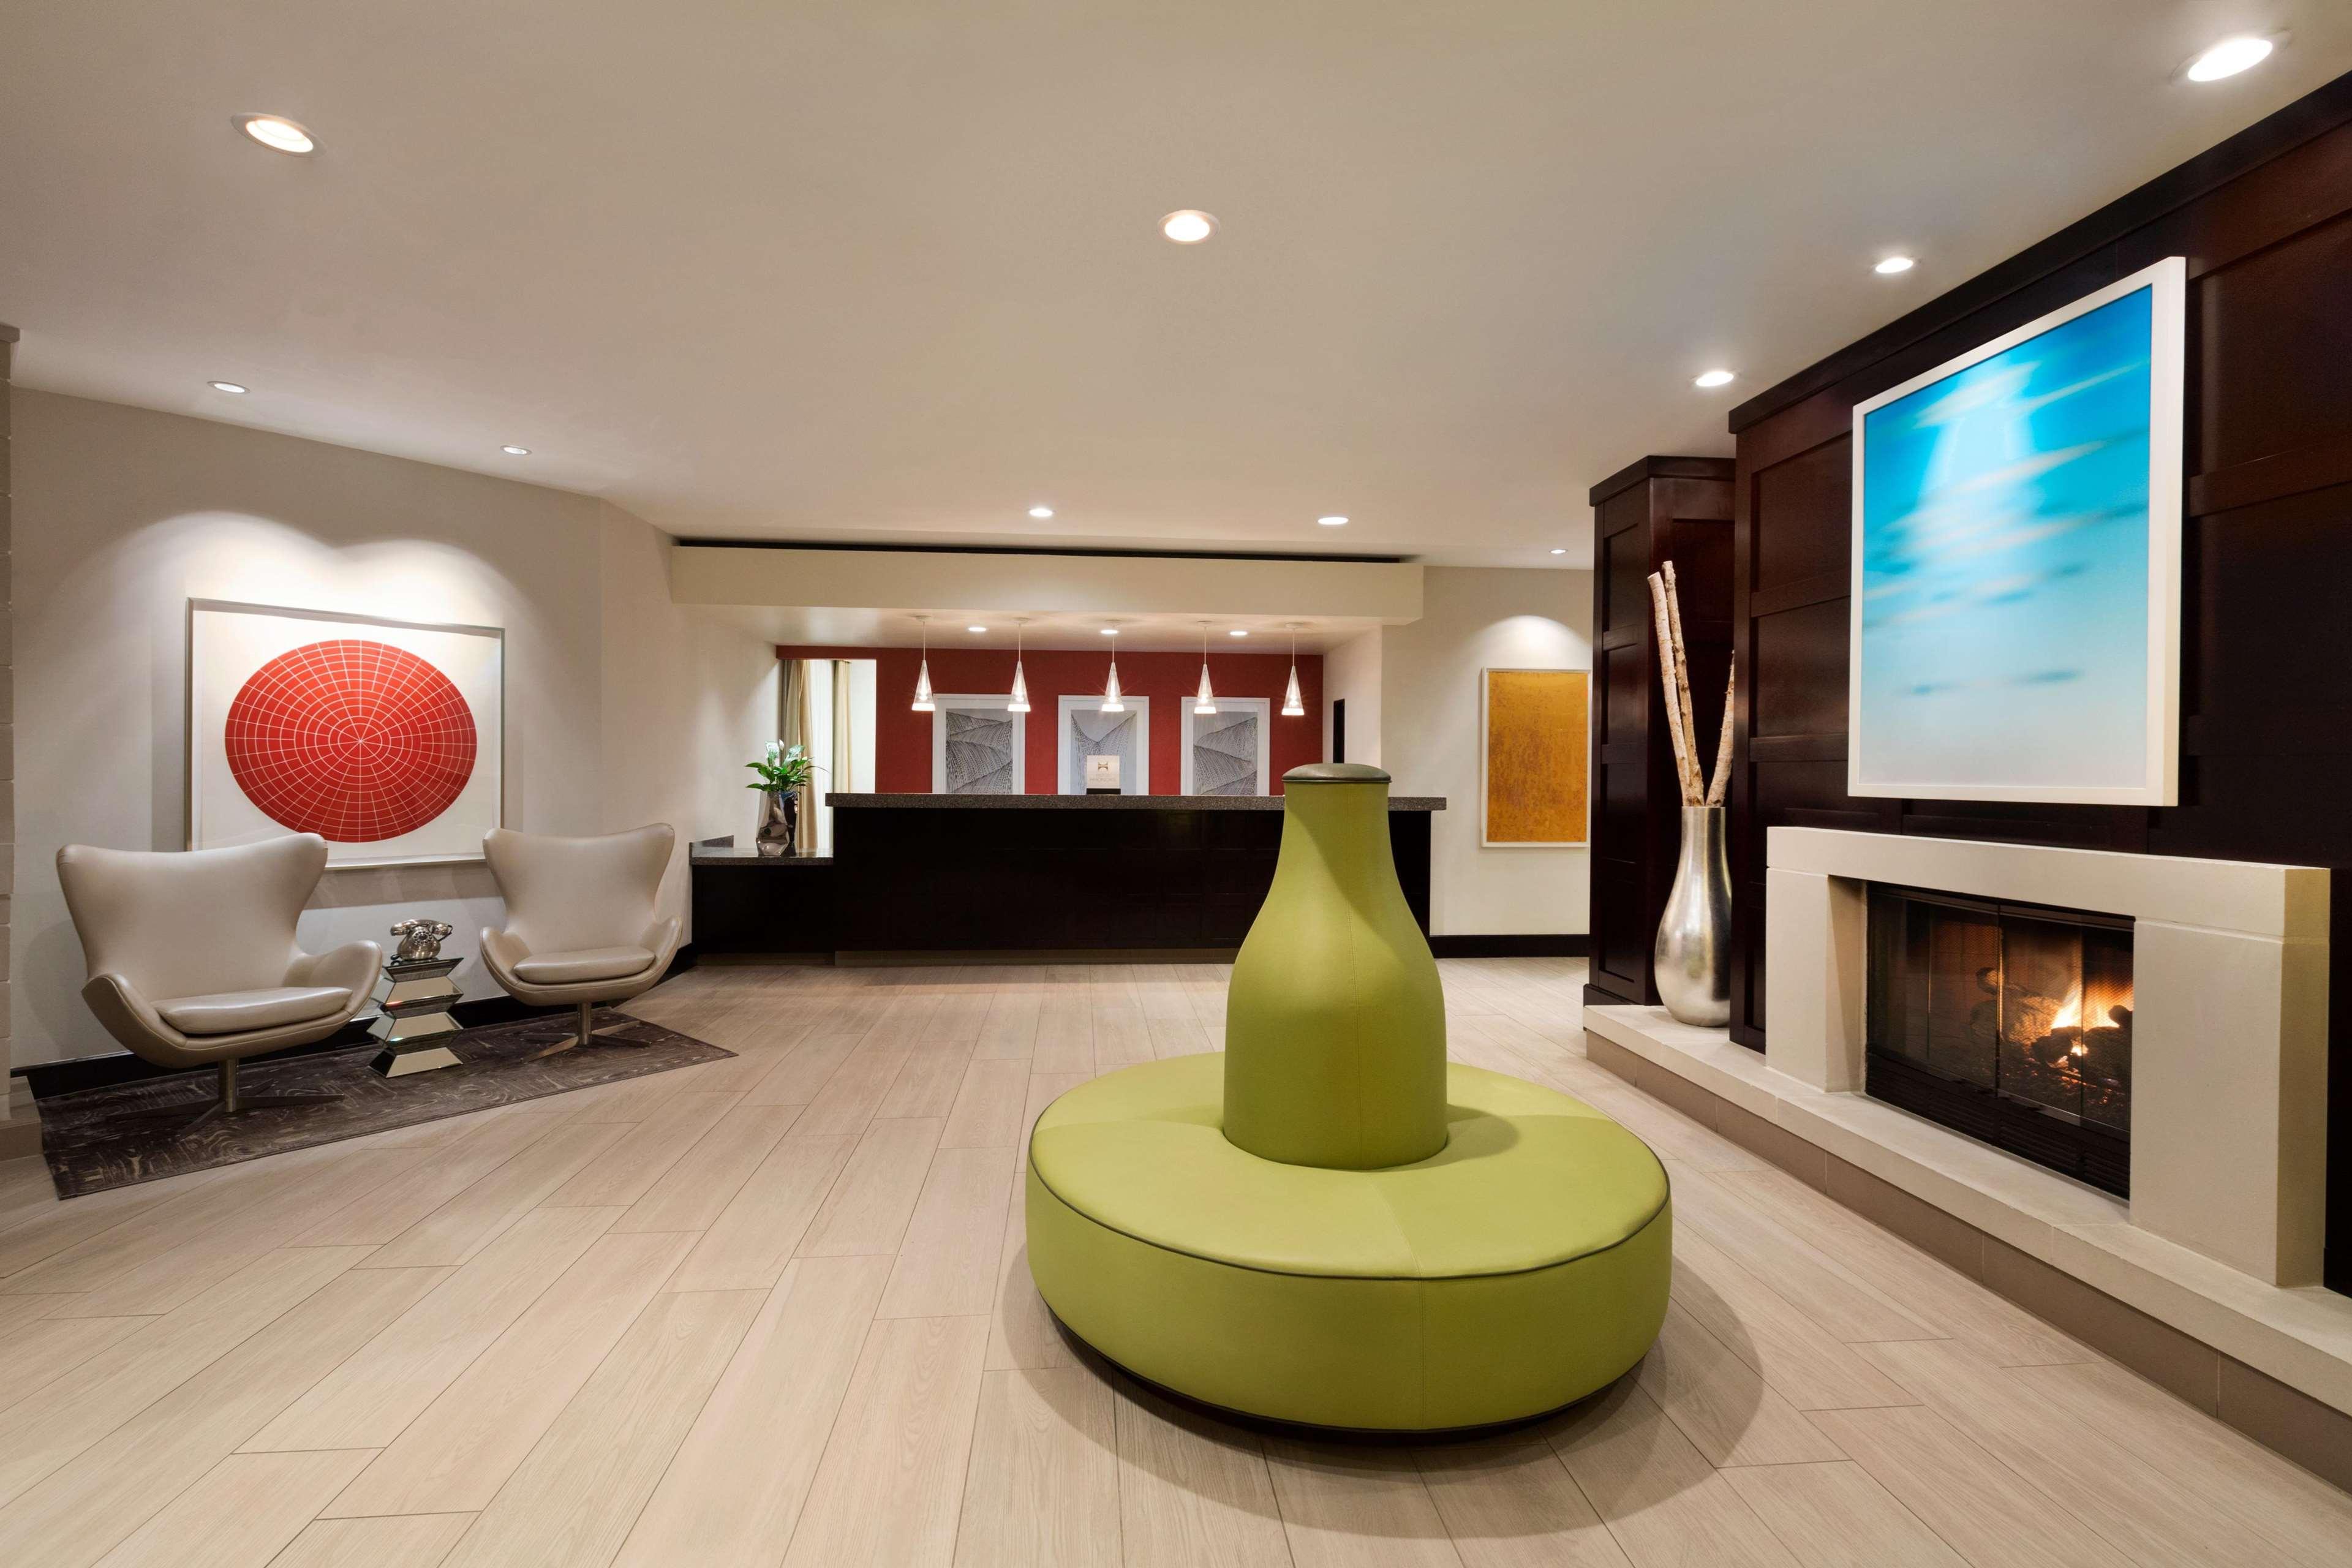 Homewood Suites by Hilton Plano-Richardson image 33